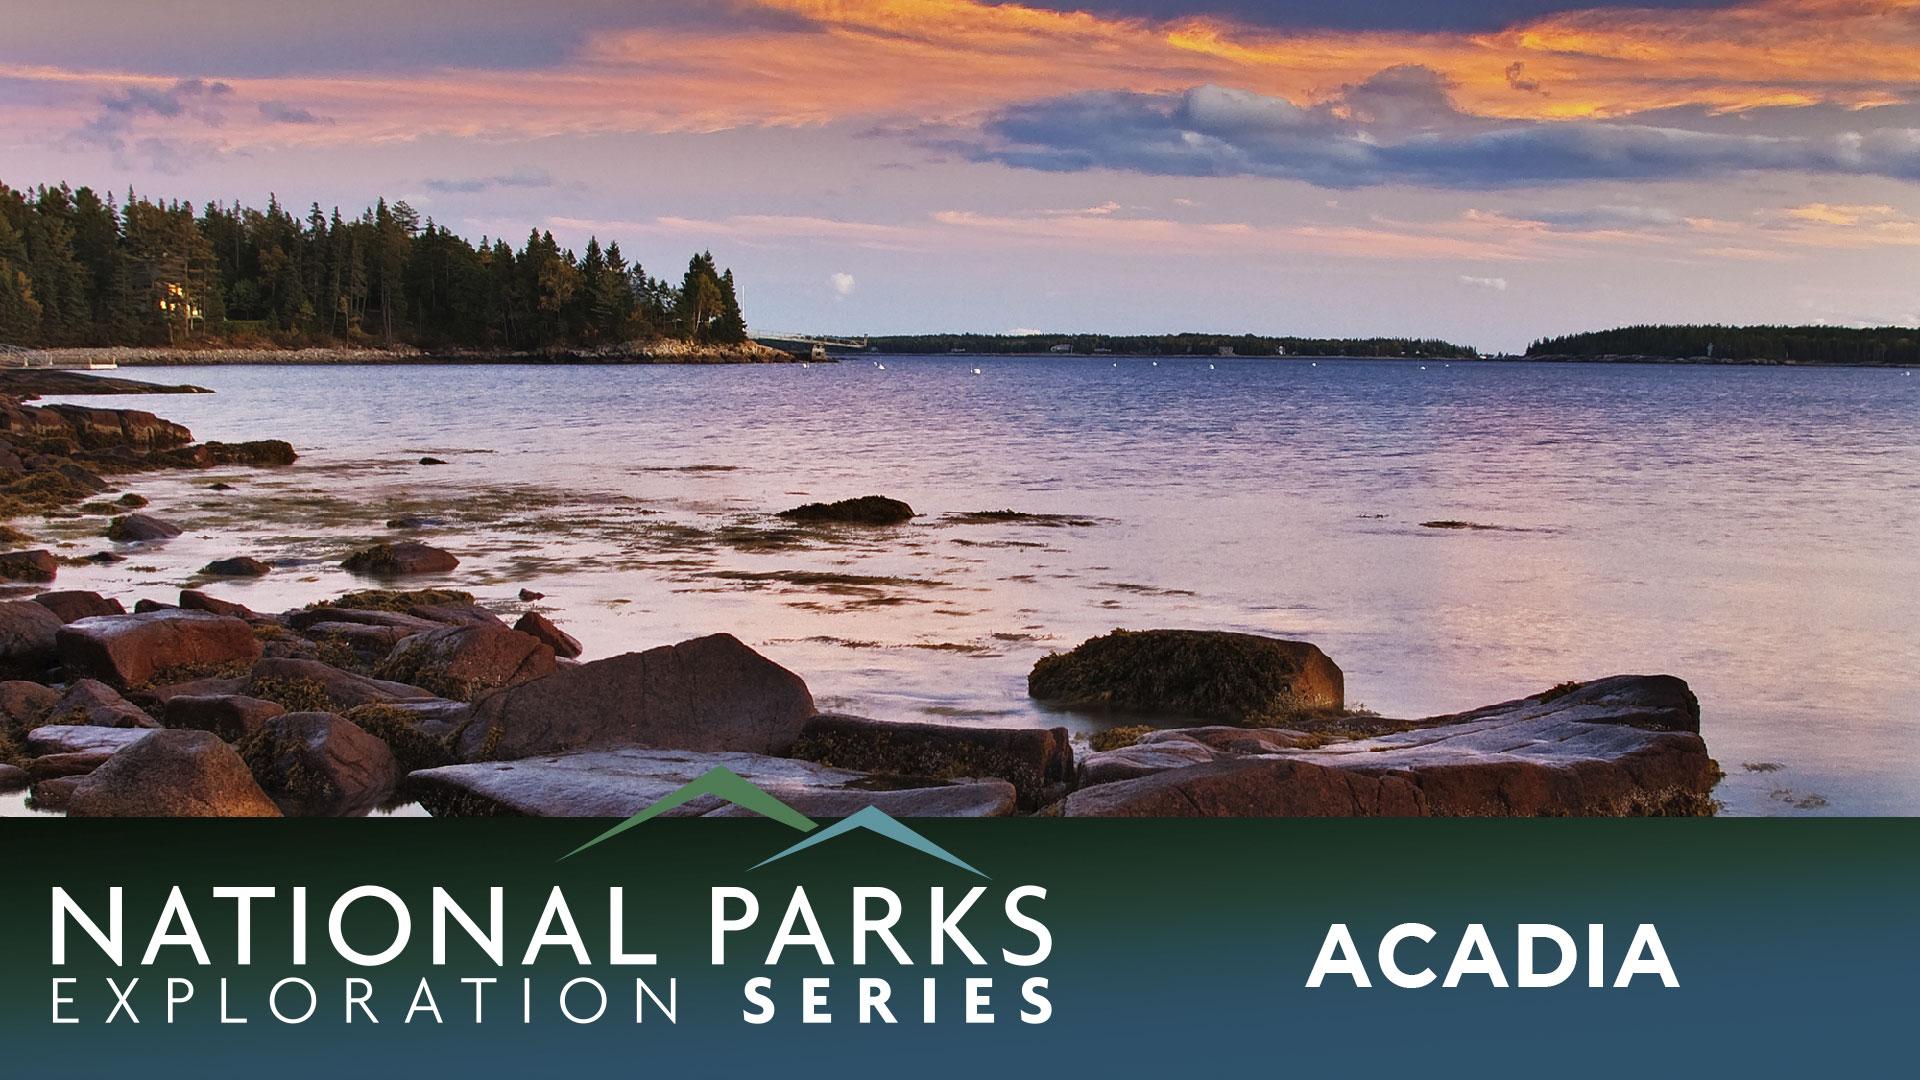 National Parks Exploration Series: Acadia